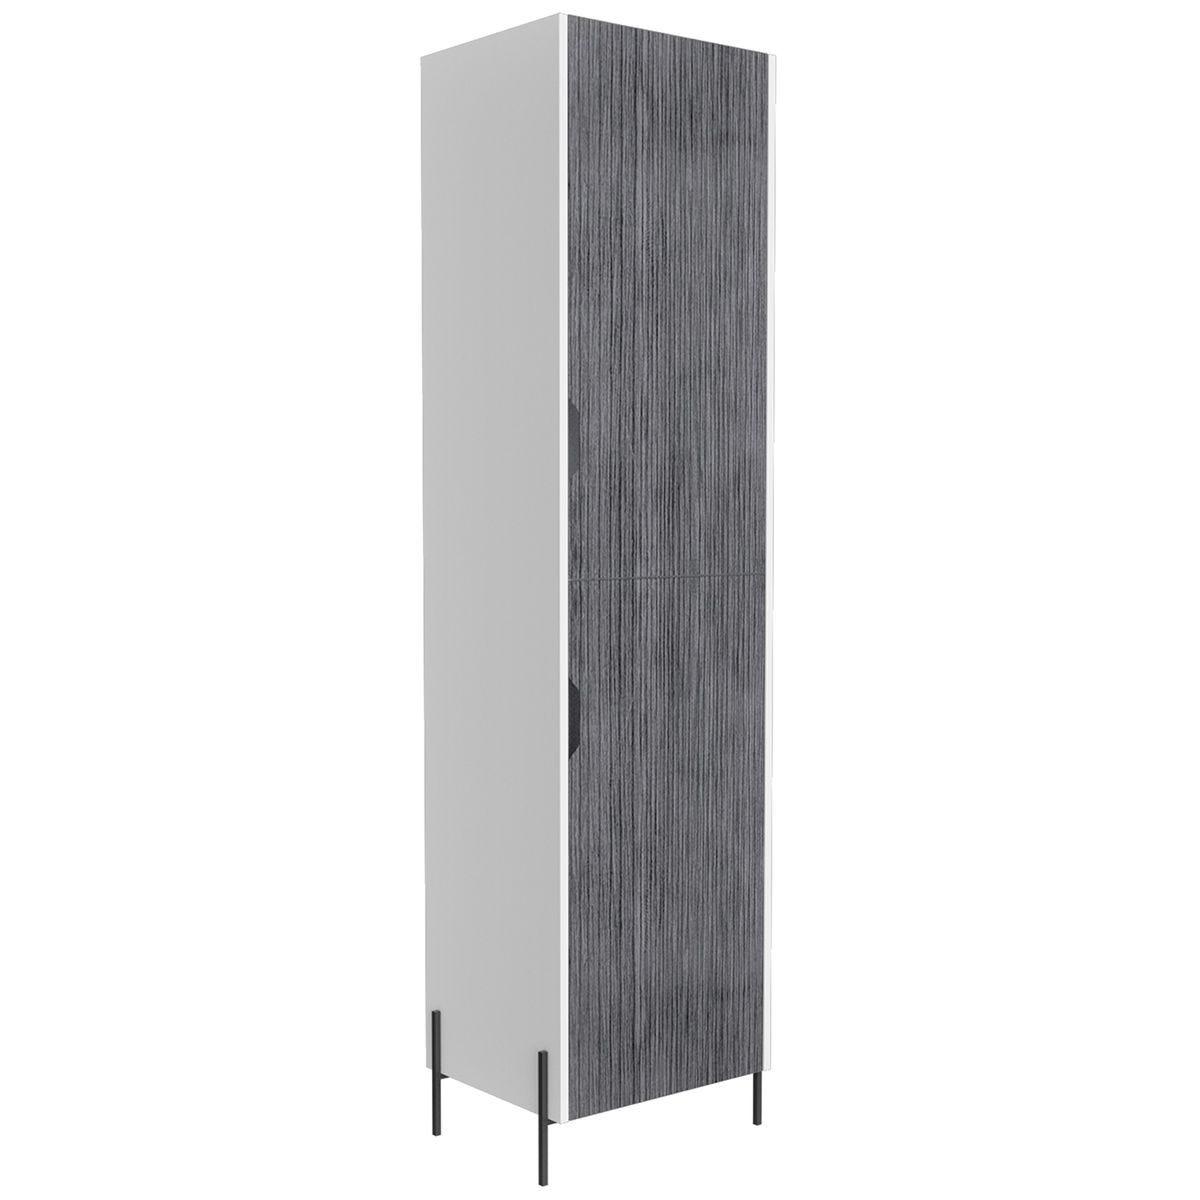 Dallas Home Office Tall Storage Cabinet